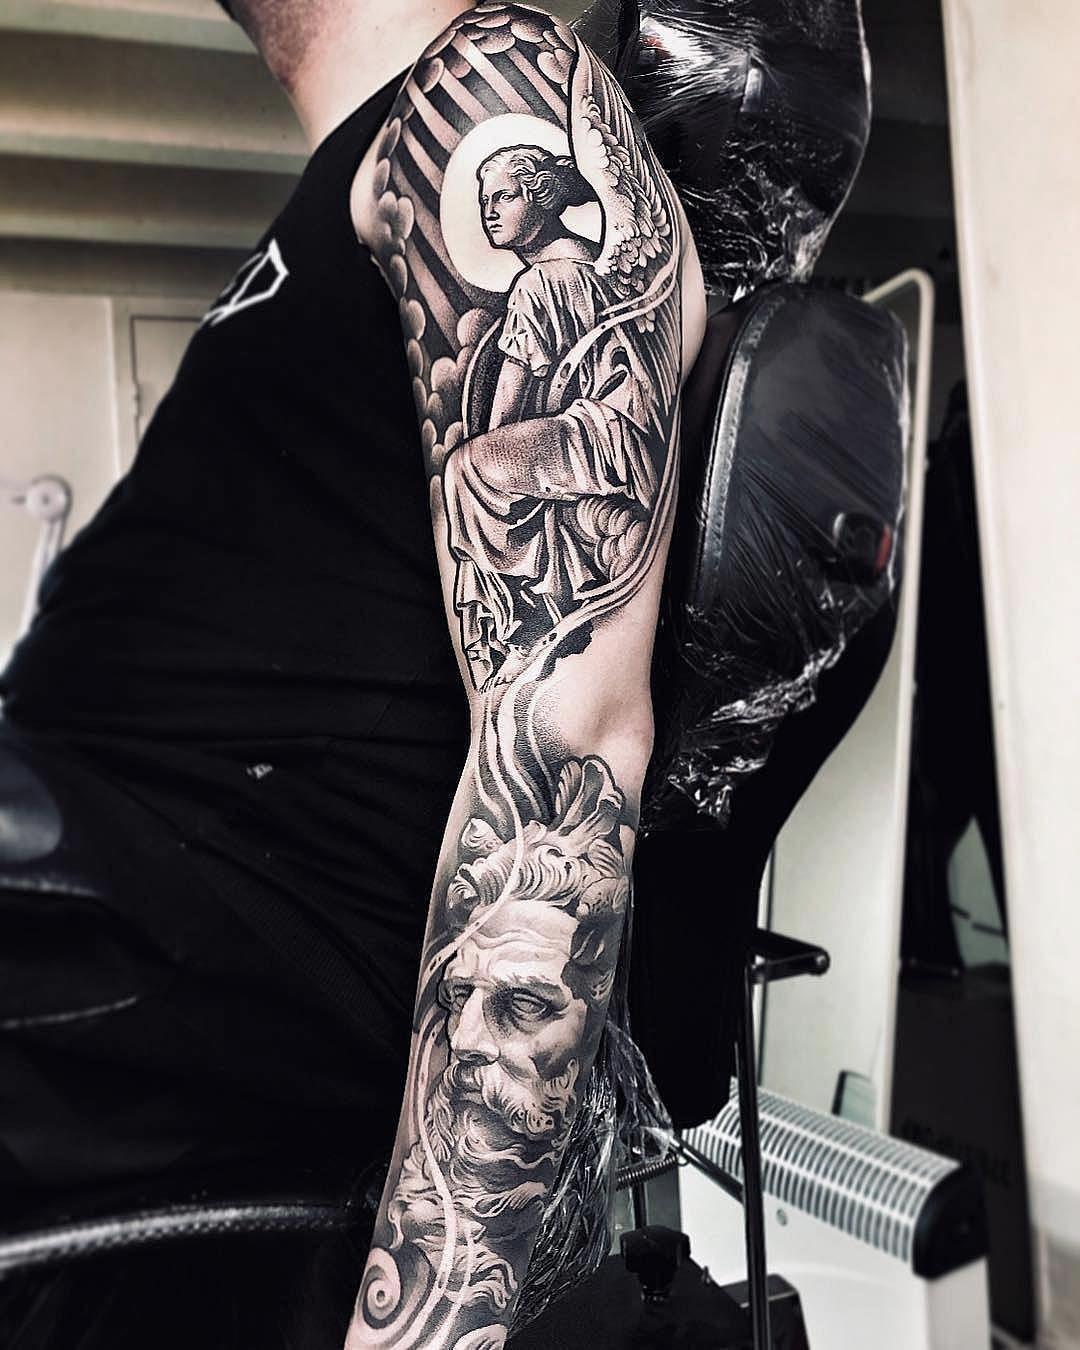 Lil Van Tattoo Artist : tattoo, artist, Atgailos, įpareigoti, Didžiuotis, Tattoo, Artist, Hundepension-bayreuth.com